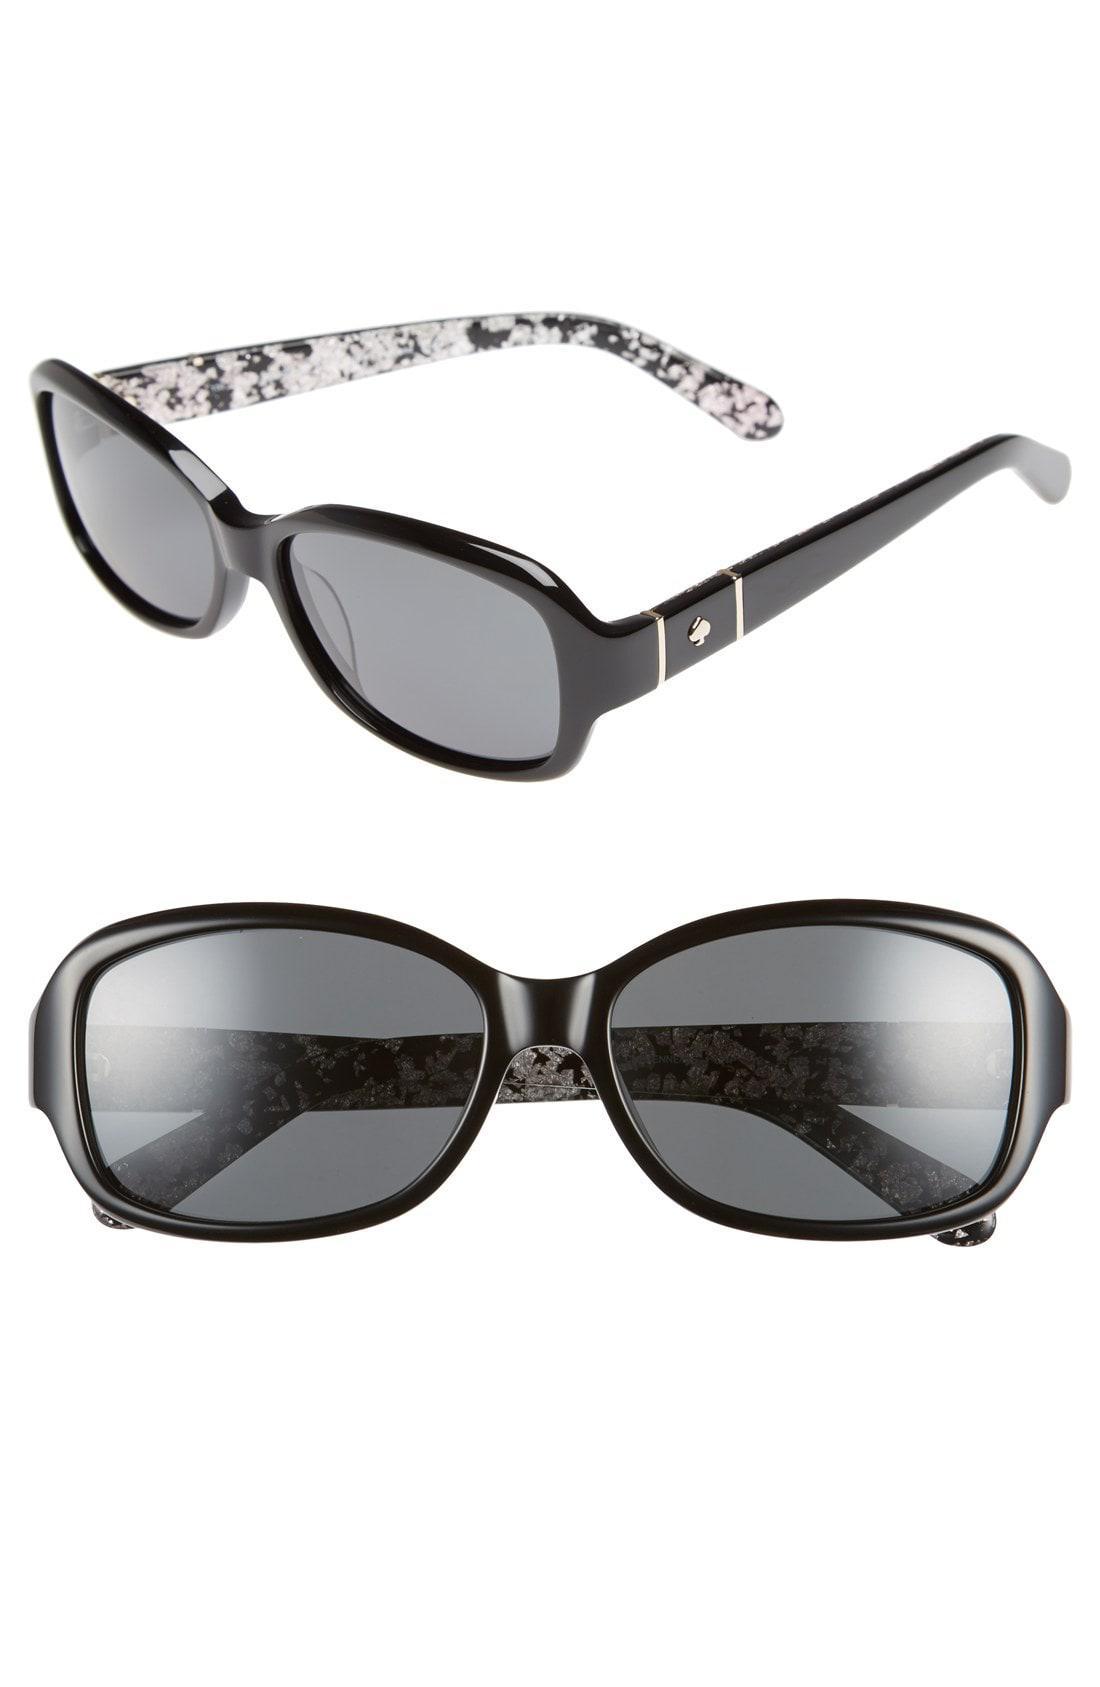 a3a3ebf52fe7d Kate Spade. Women s Cheyenne 55mm Polarized Sunglasses -